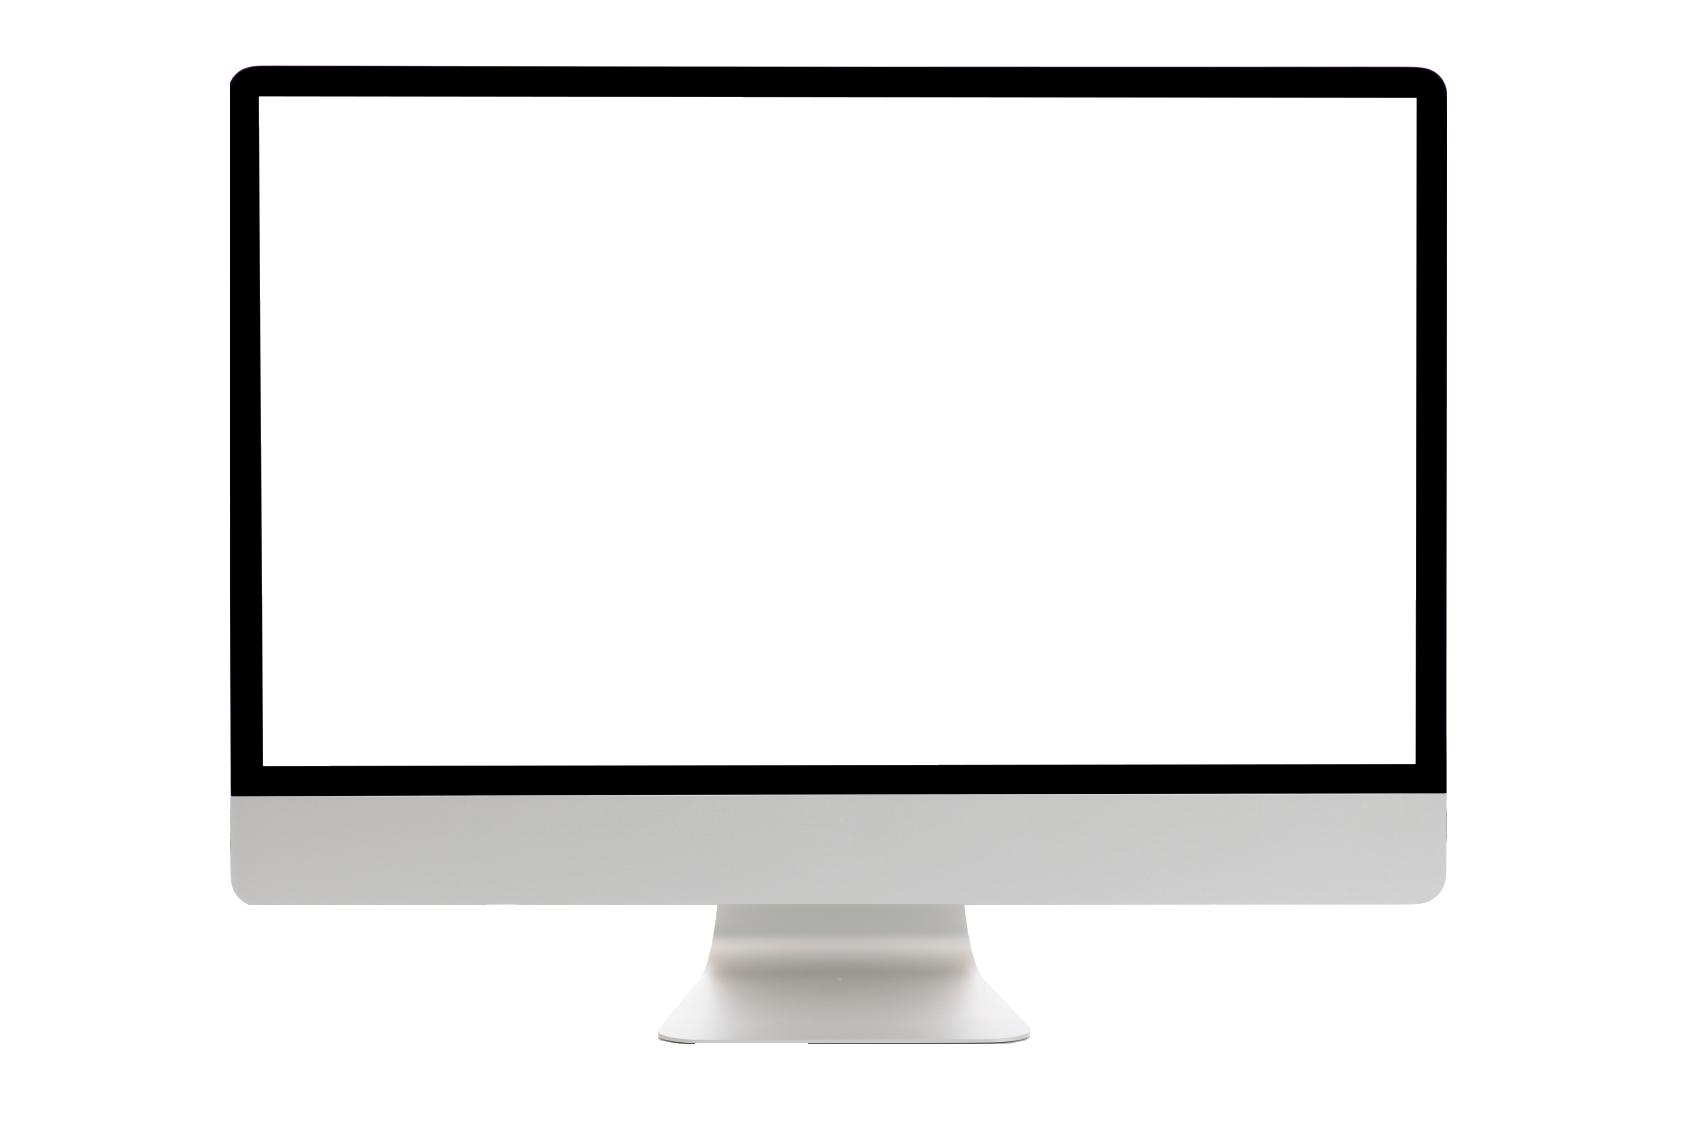 Mac Desktop Template Png Google Search Mac Desktop Electronic Products Imac